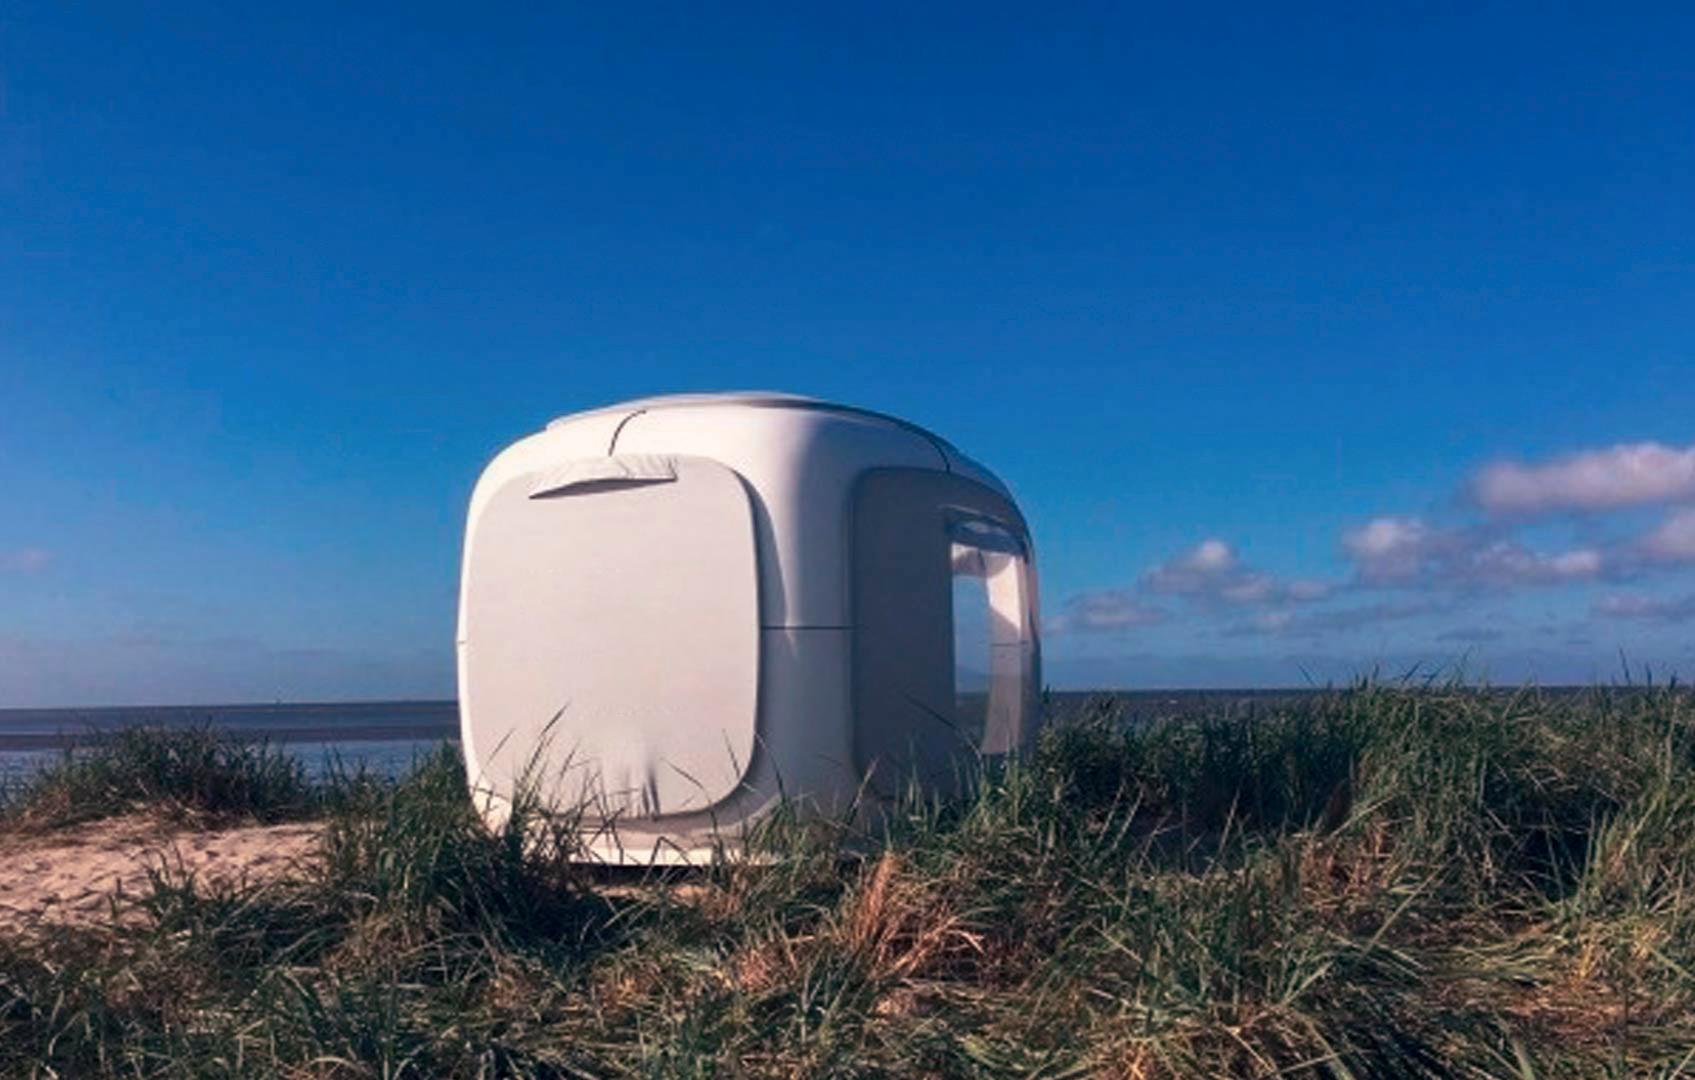 sleeperoo-cube-1-uen-preis-b-mo-do-friesland-cube-ebbe-am-strand-bg5